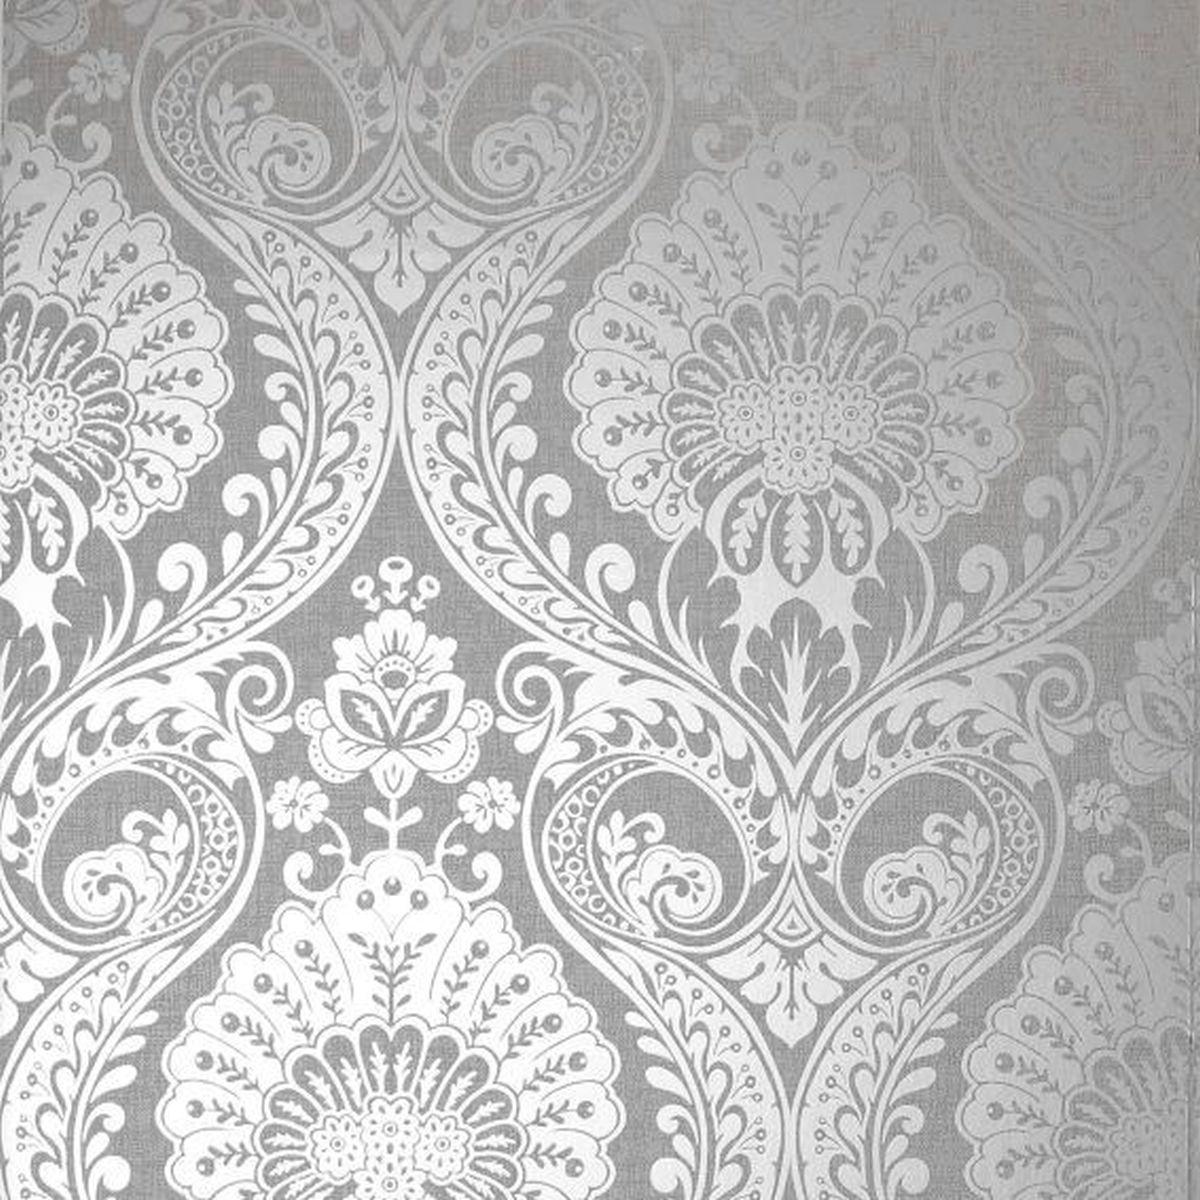 Best of Arthouse Vliestapete Erstklassige Tapete 906609 Grau Barock Tapete